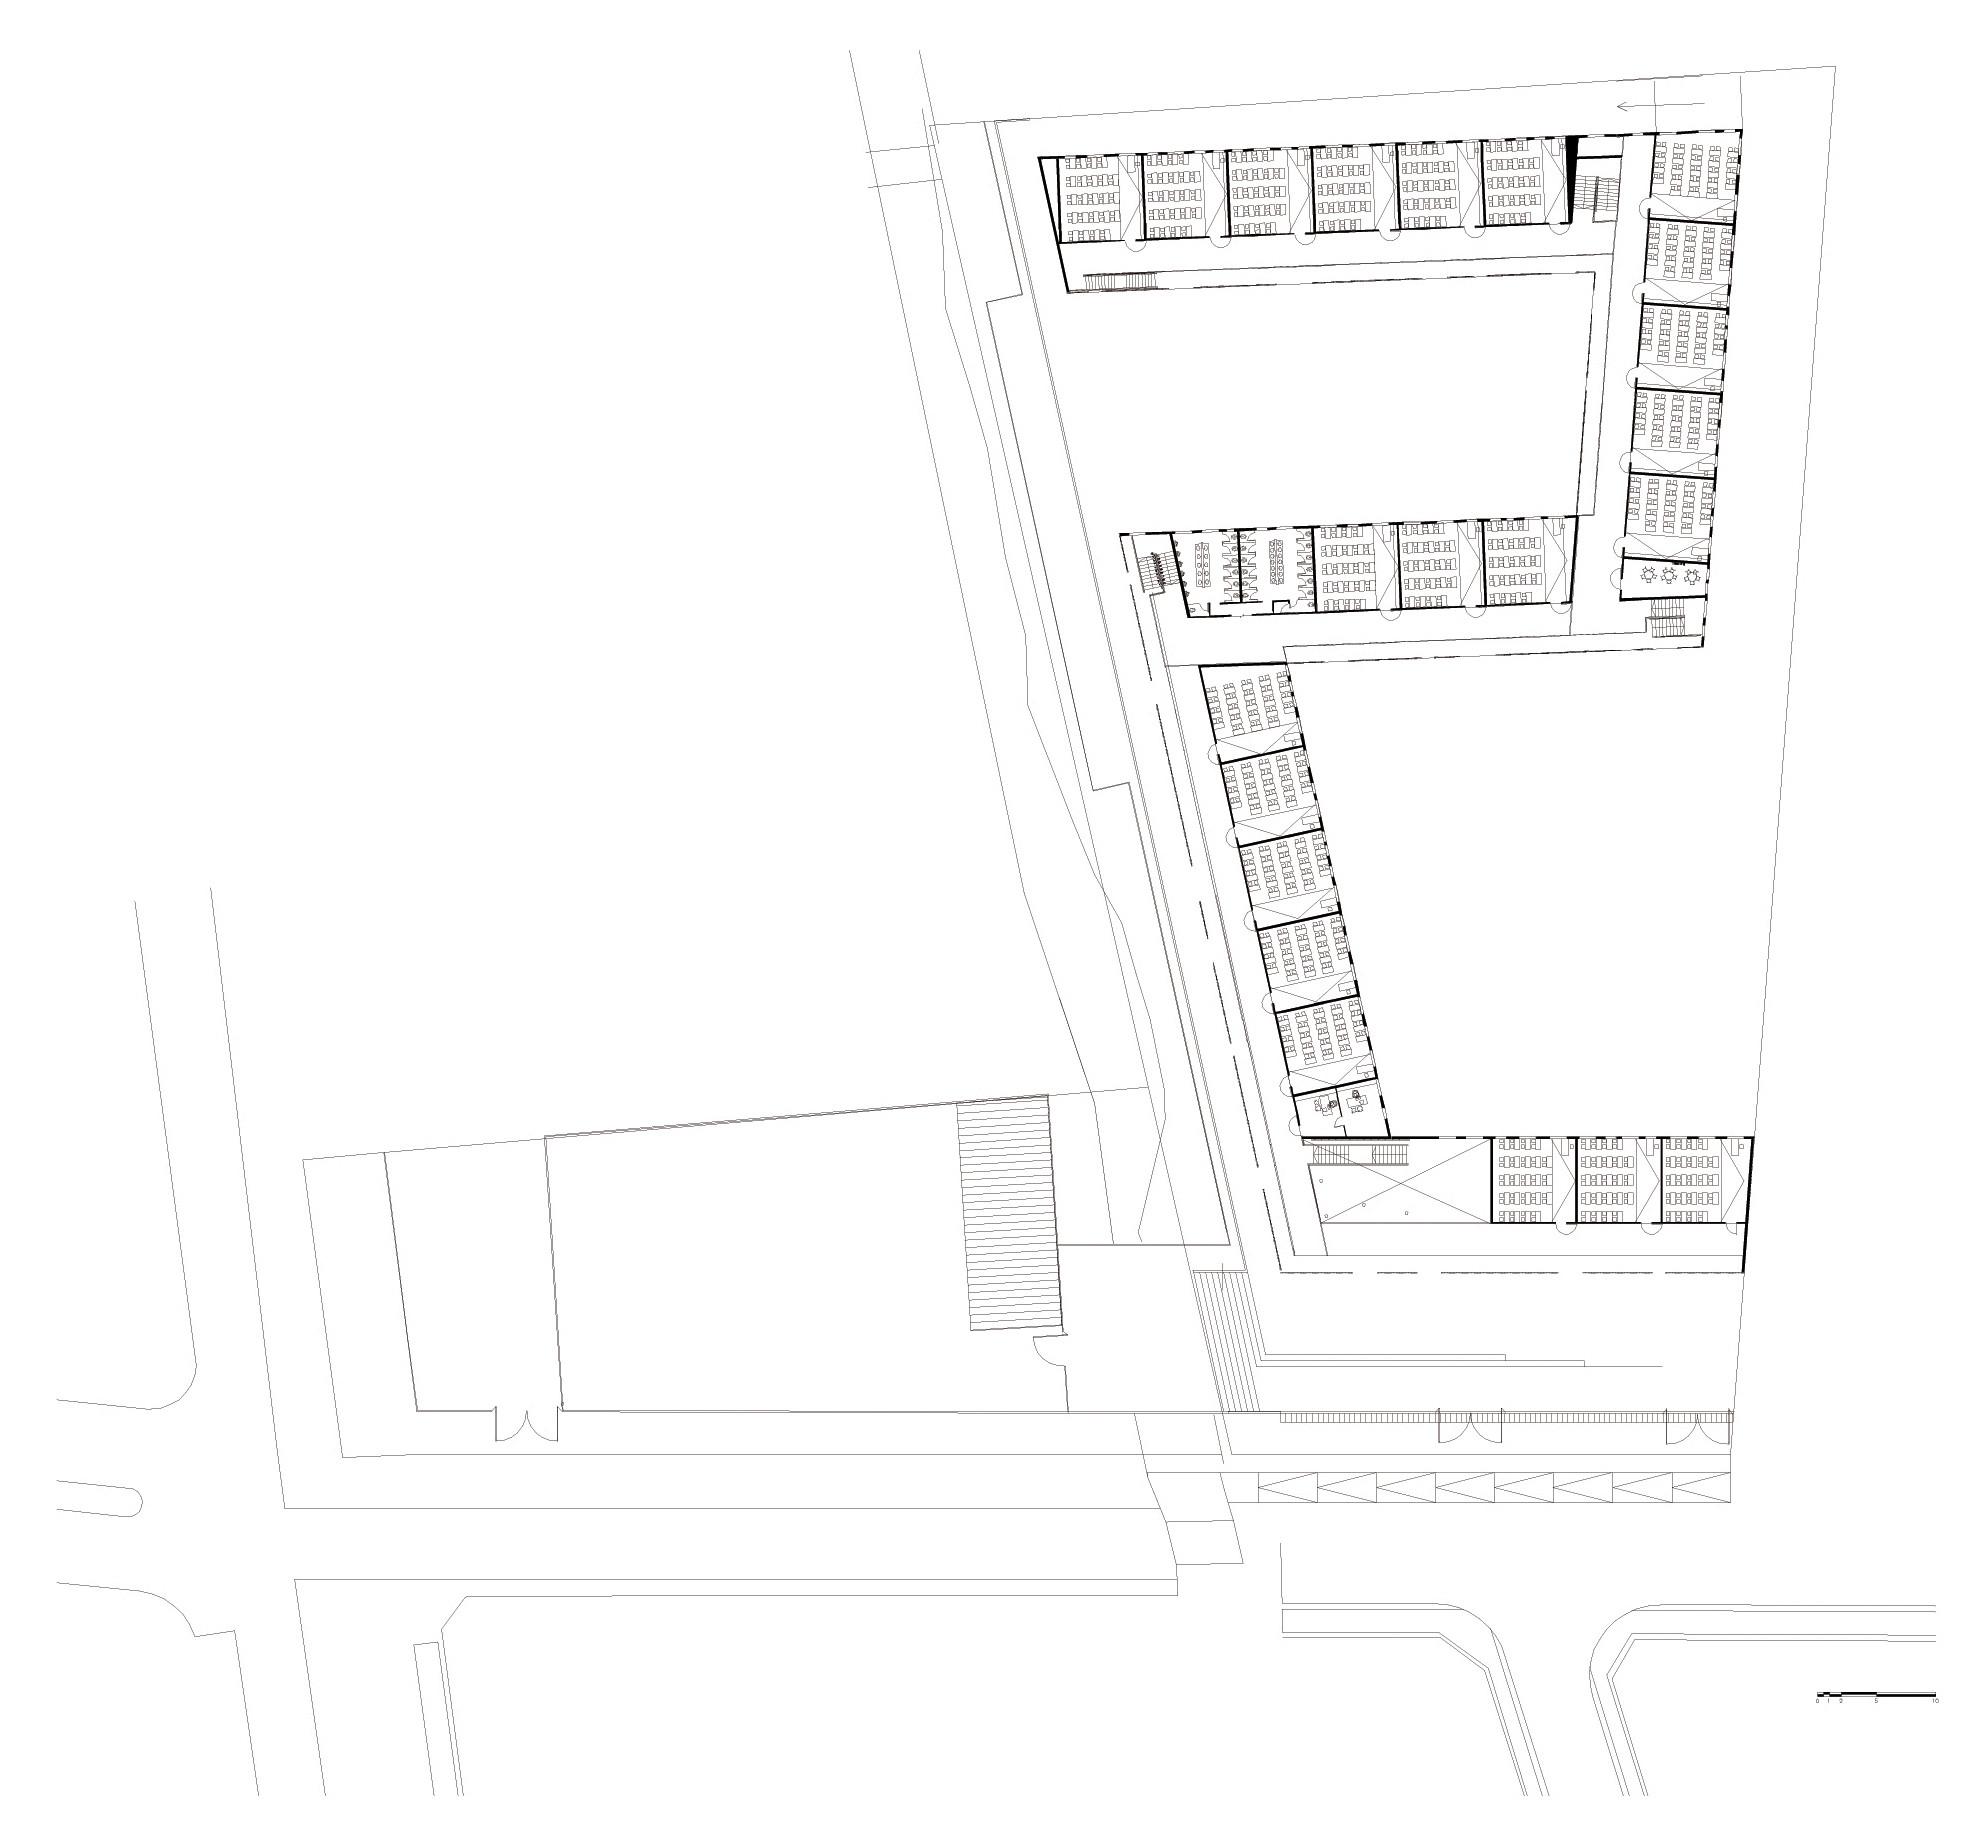 Galeria de escola san sebasti n tidy arquitectos 19 - Arquitectos san sebastian ...